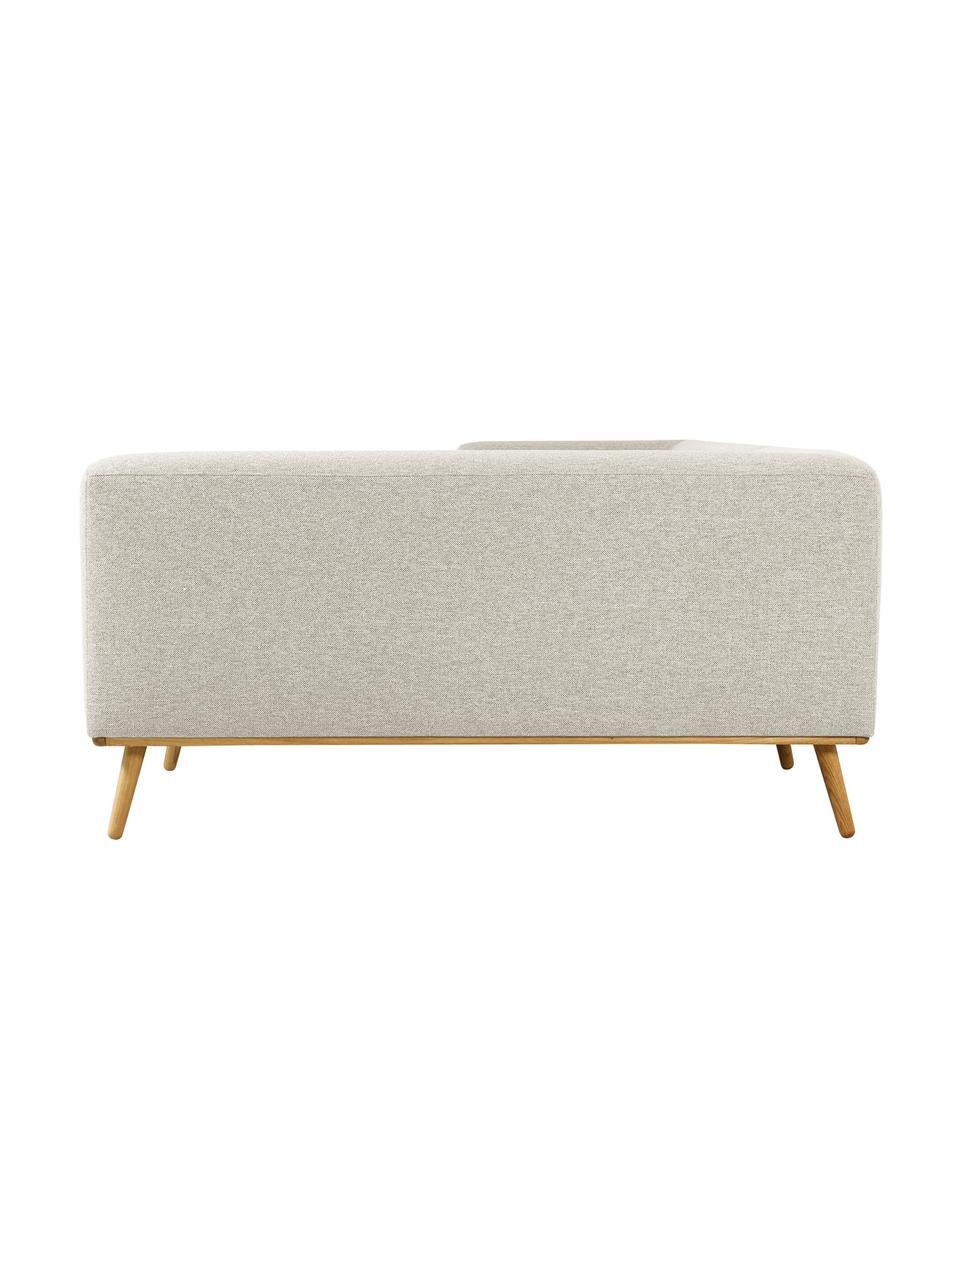 Canapé d'angle beige Archie, Tissu beige